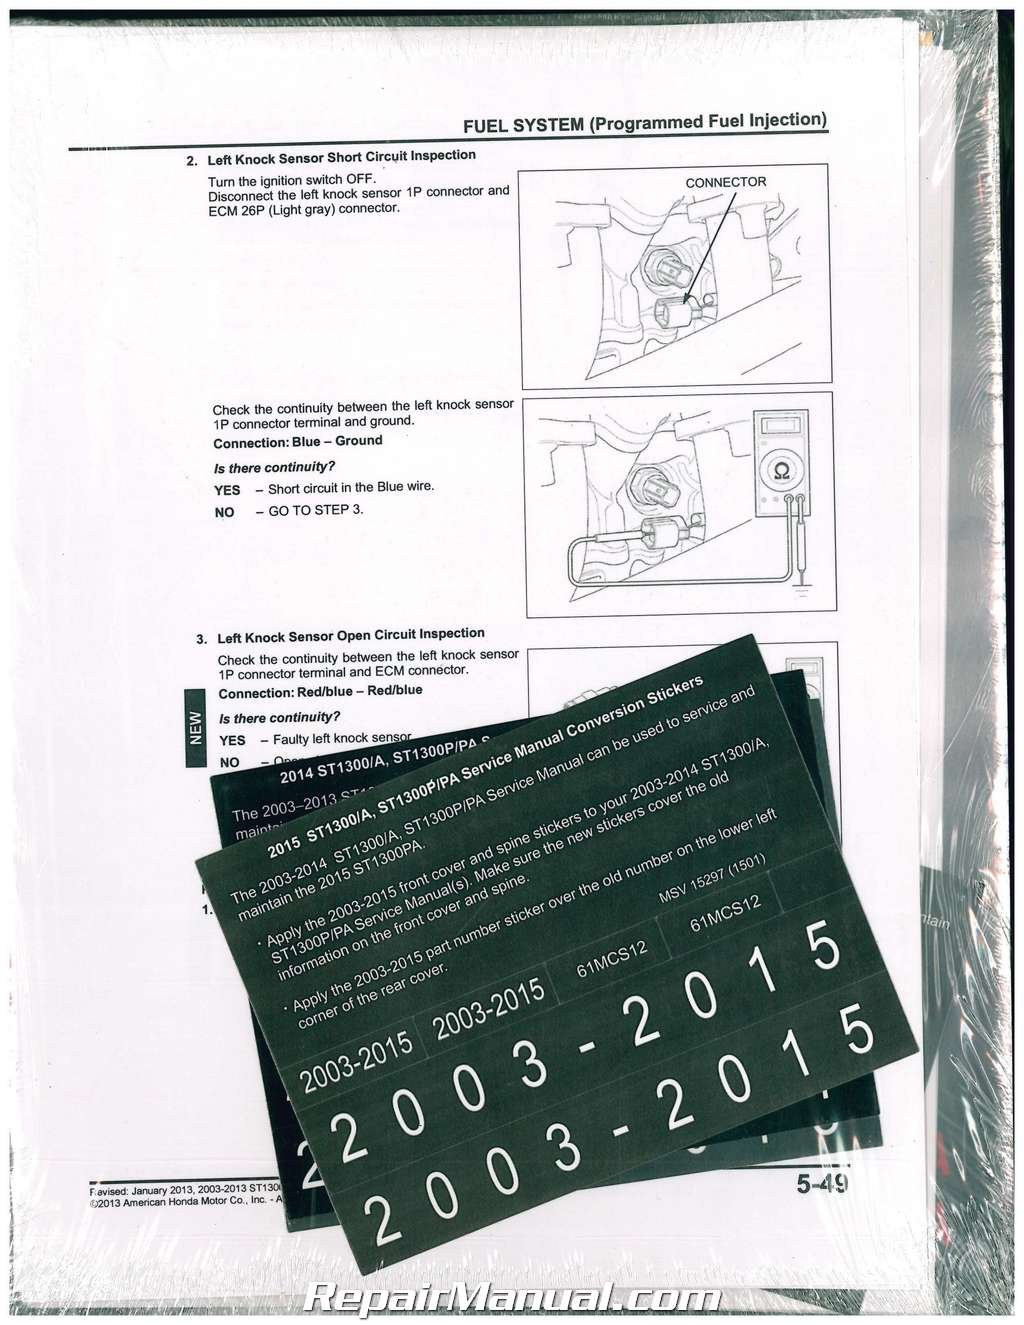 61mcs12 2003-2015 honda st1300 a p pa motorcycle service manual paperback –  2015